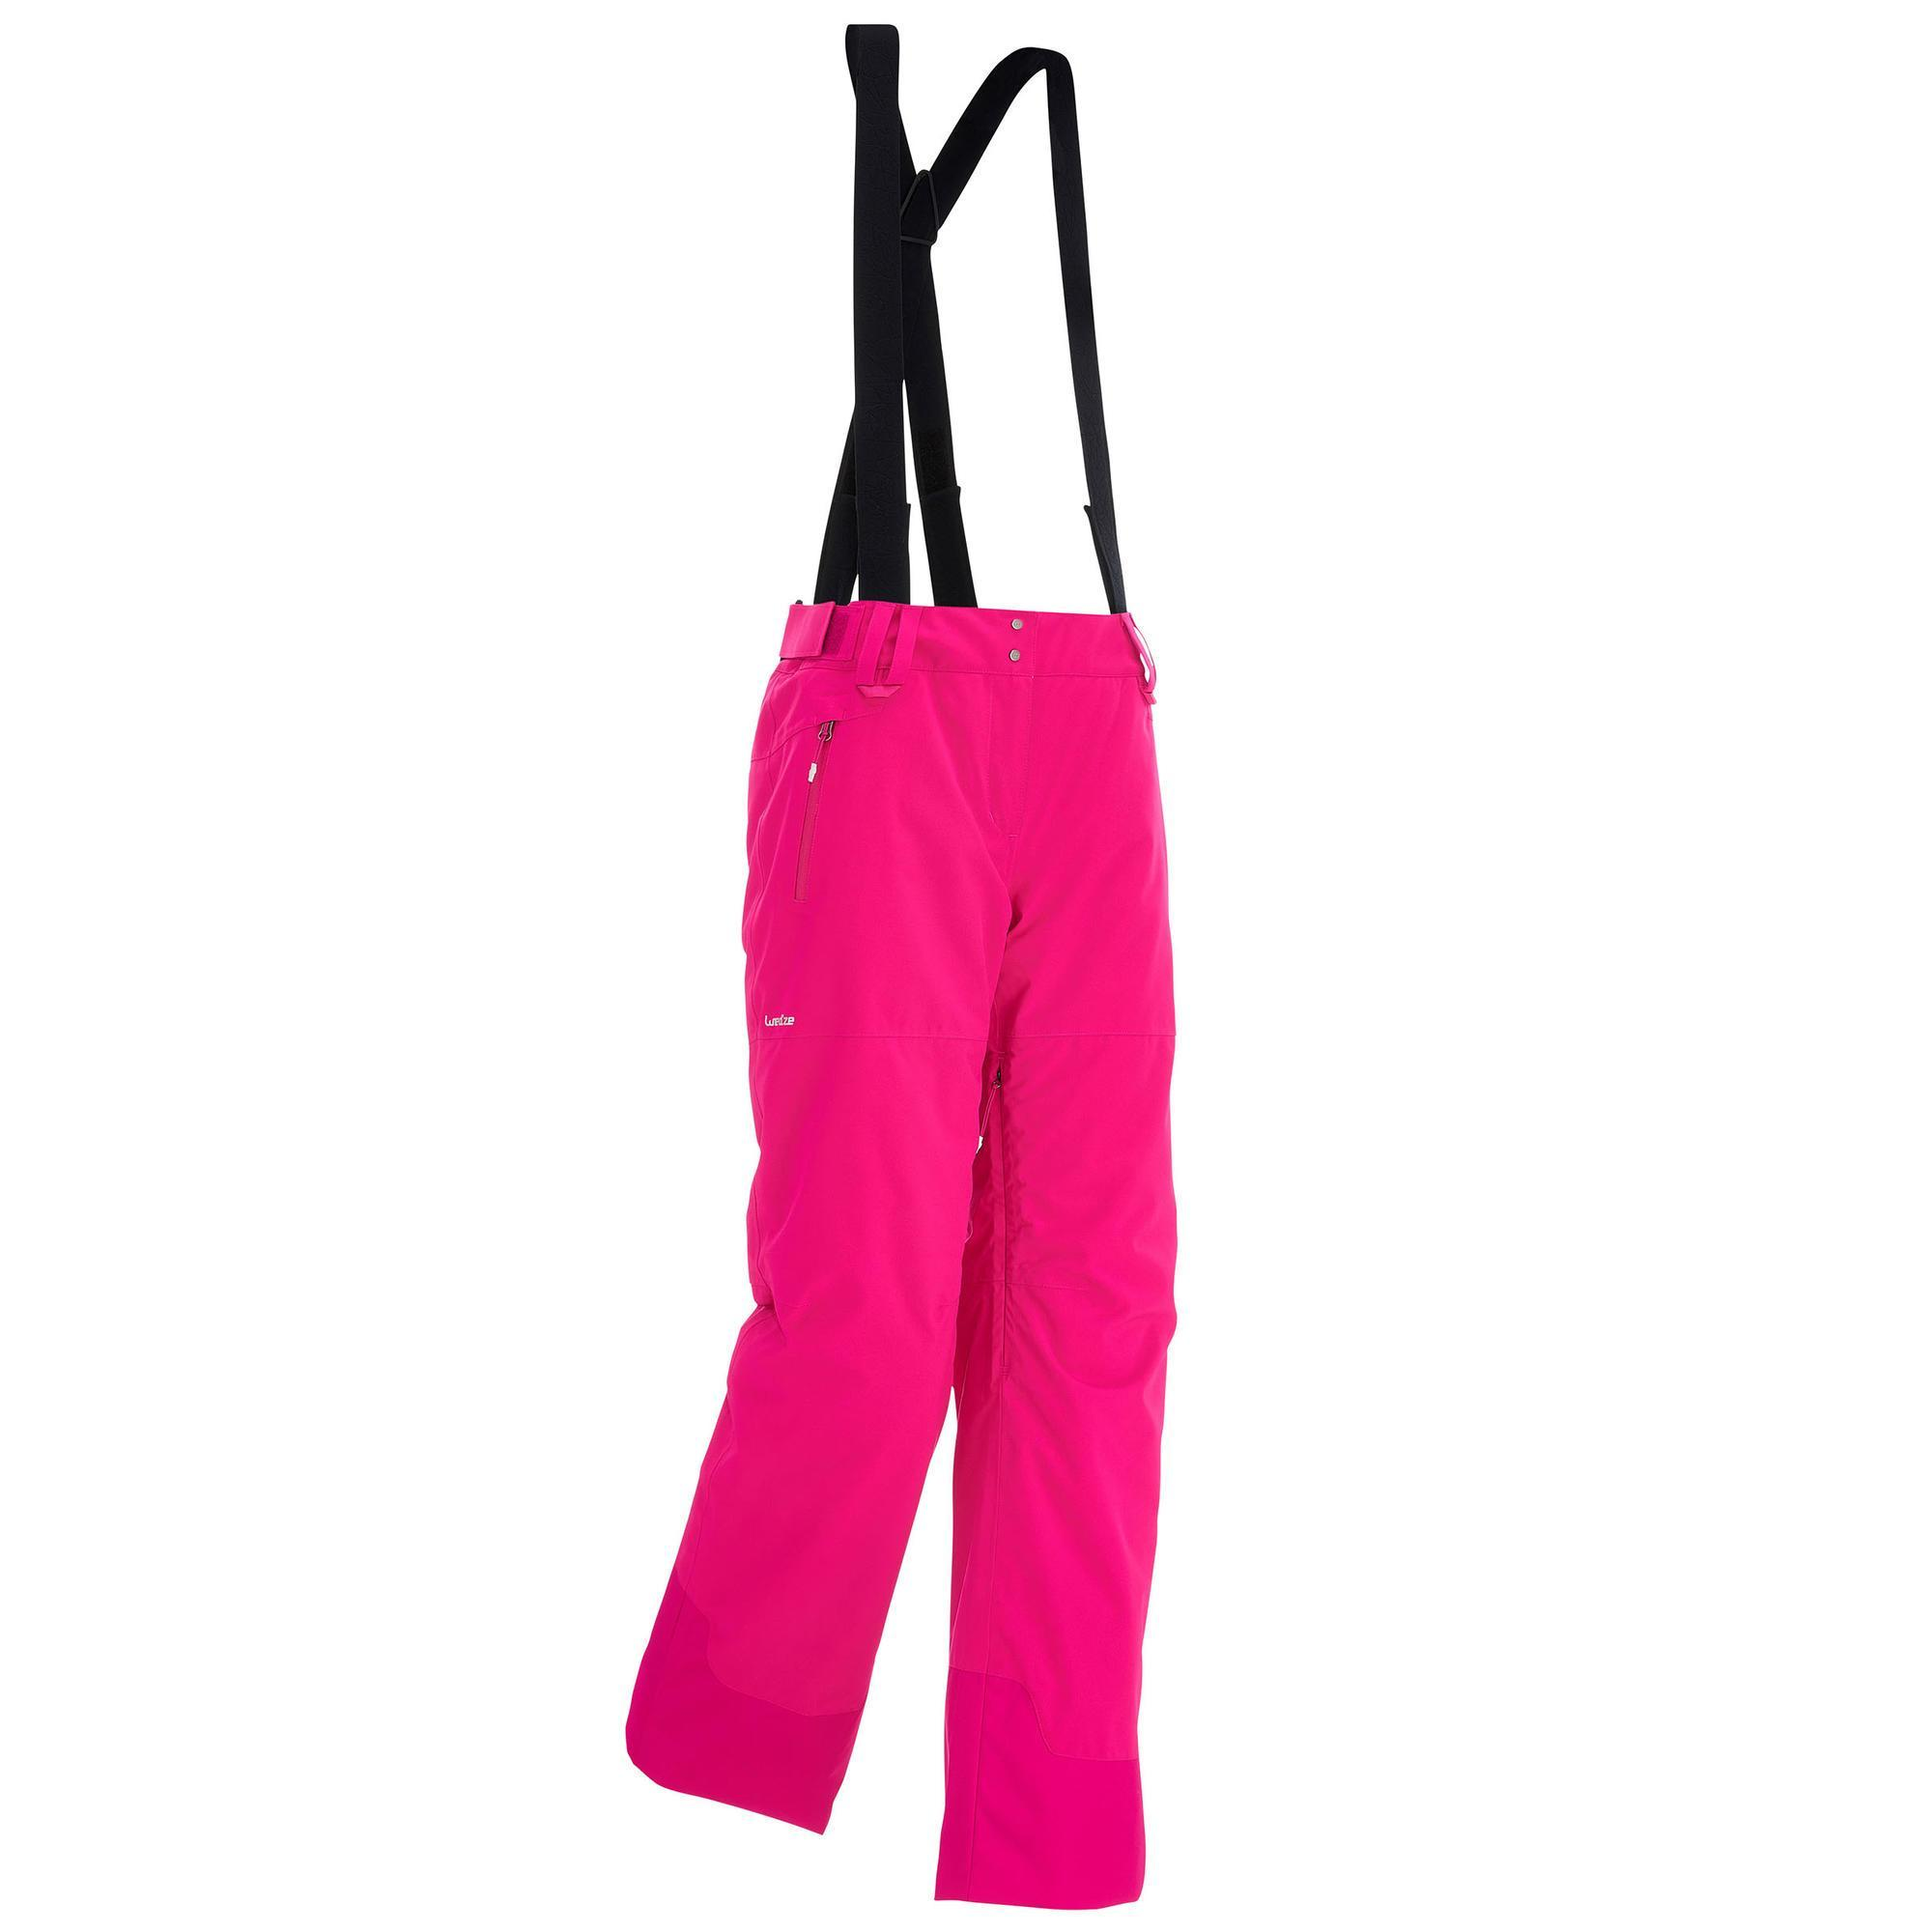 Damen Skihose Free 500 Damen rosa   03608449875158